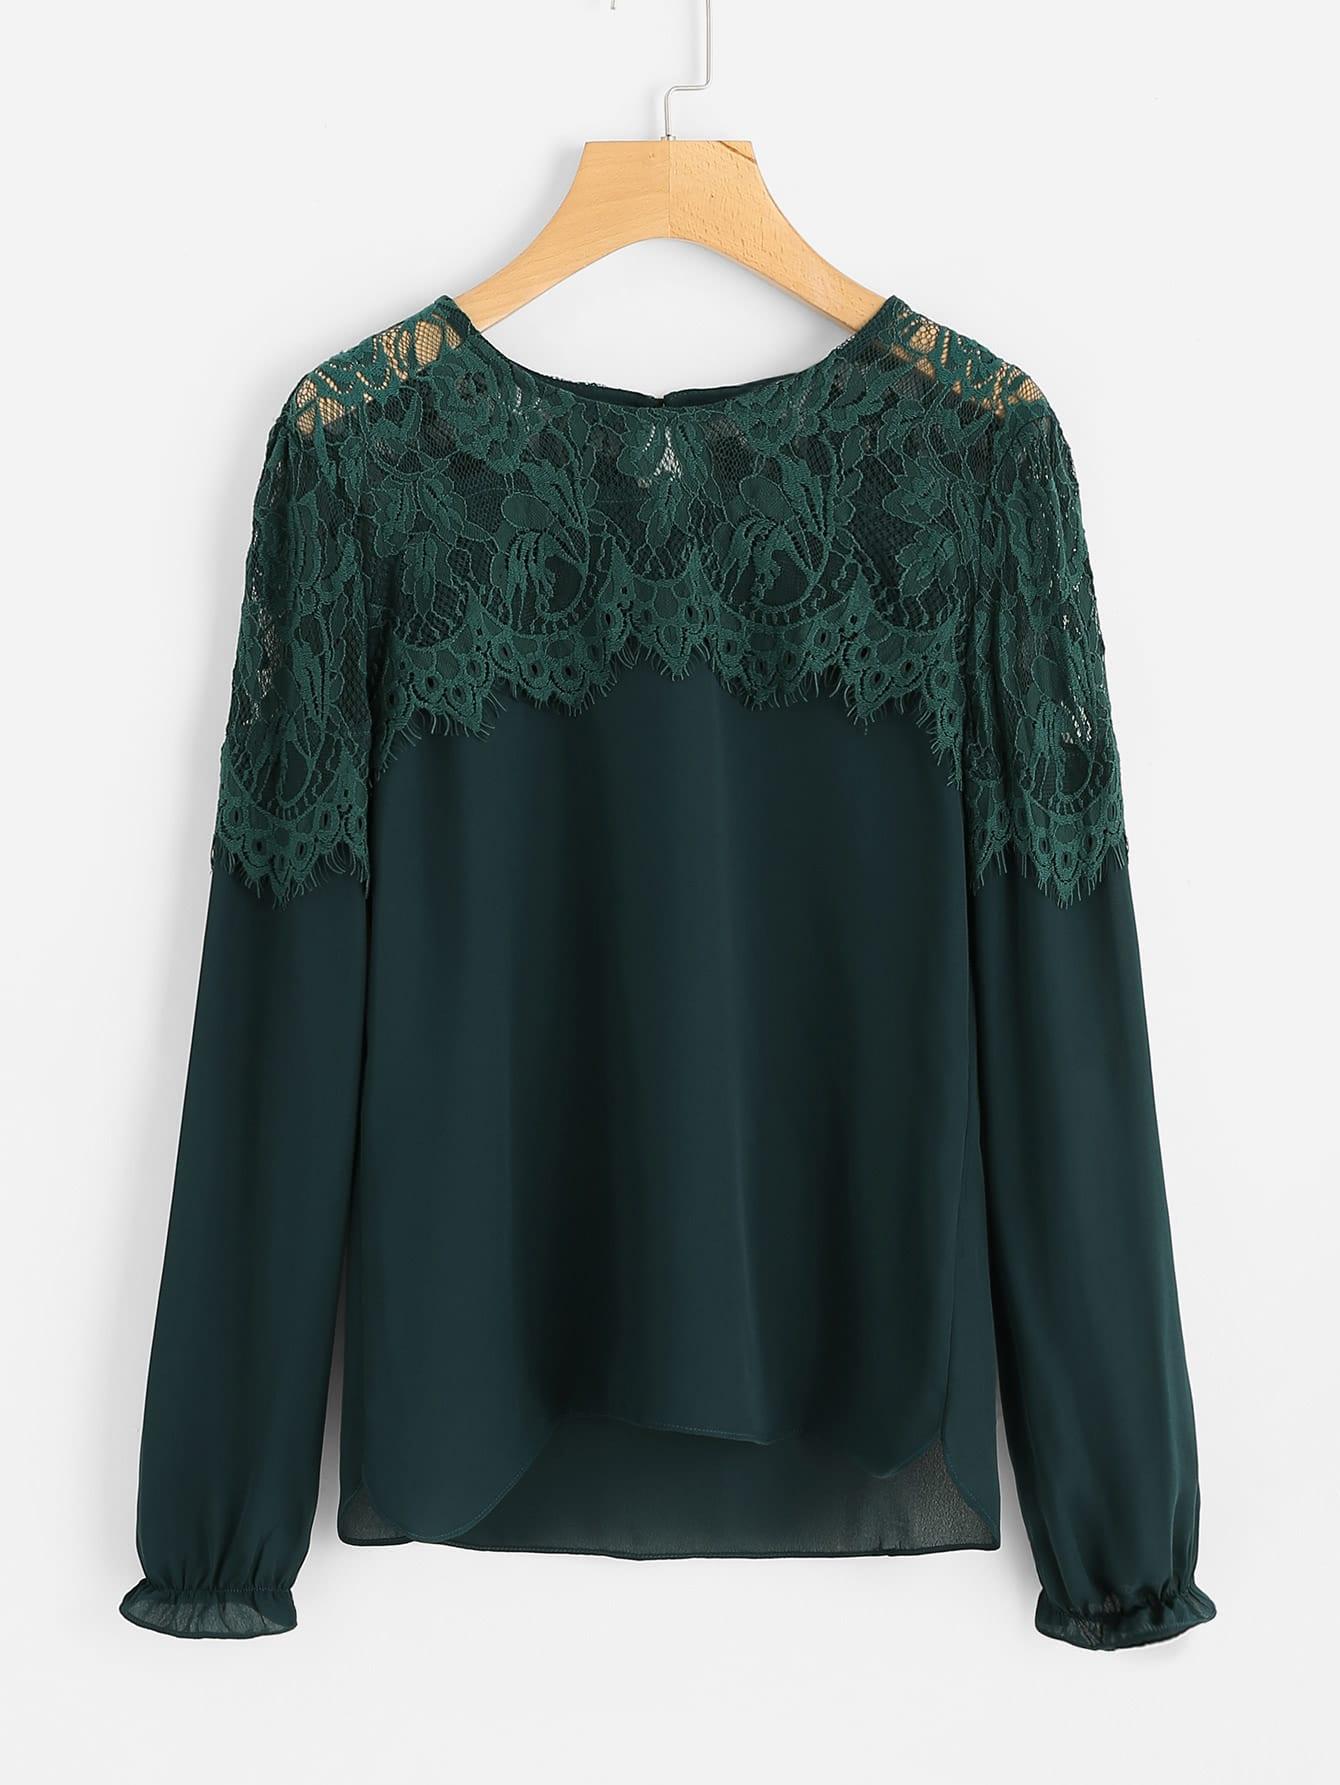 Contrast Lace Yoke Keyhole Back Blouse lace panel yoke sweatshirt